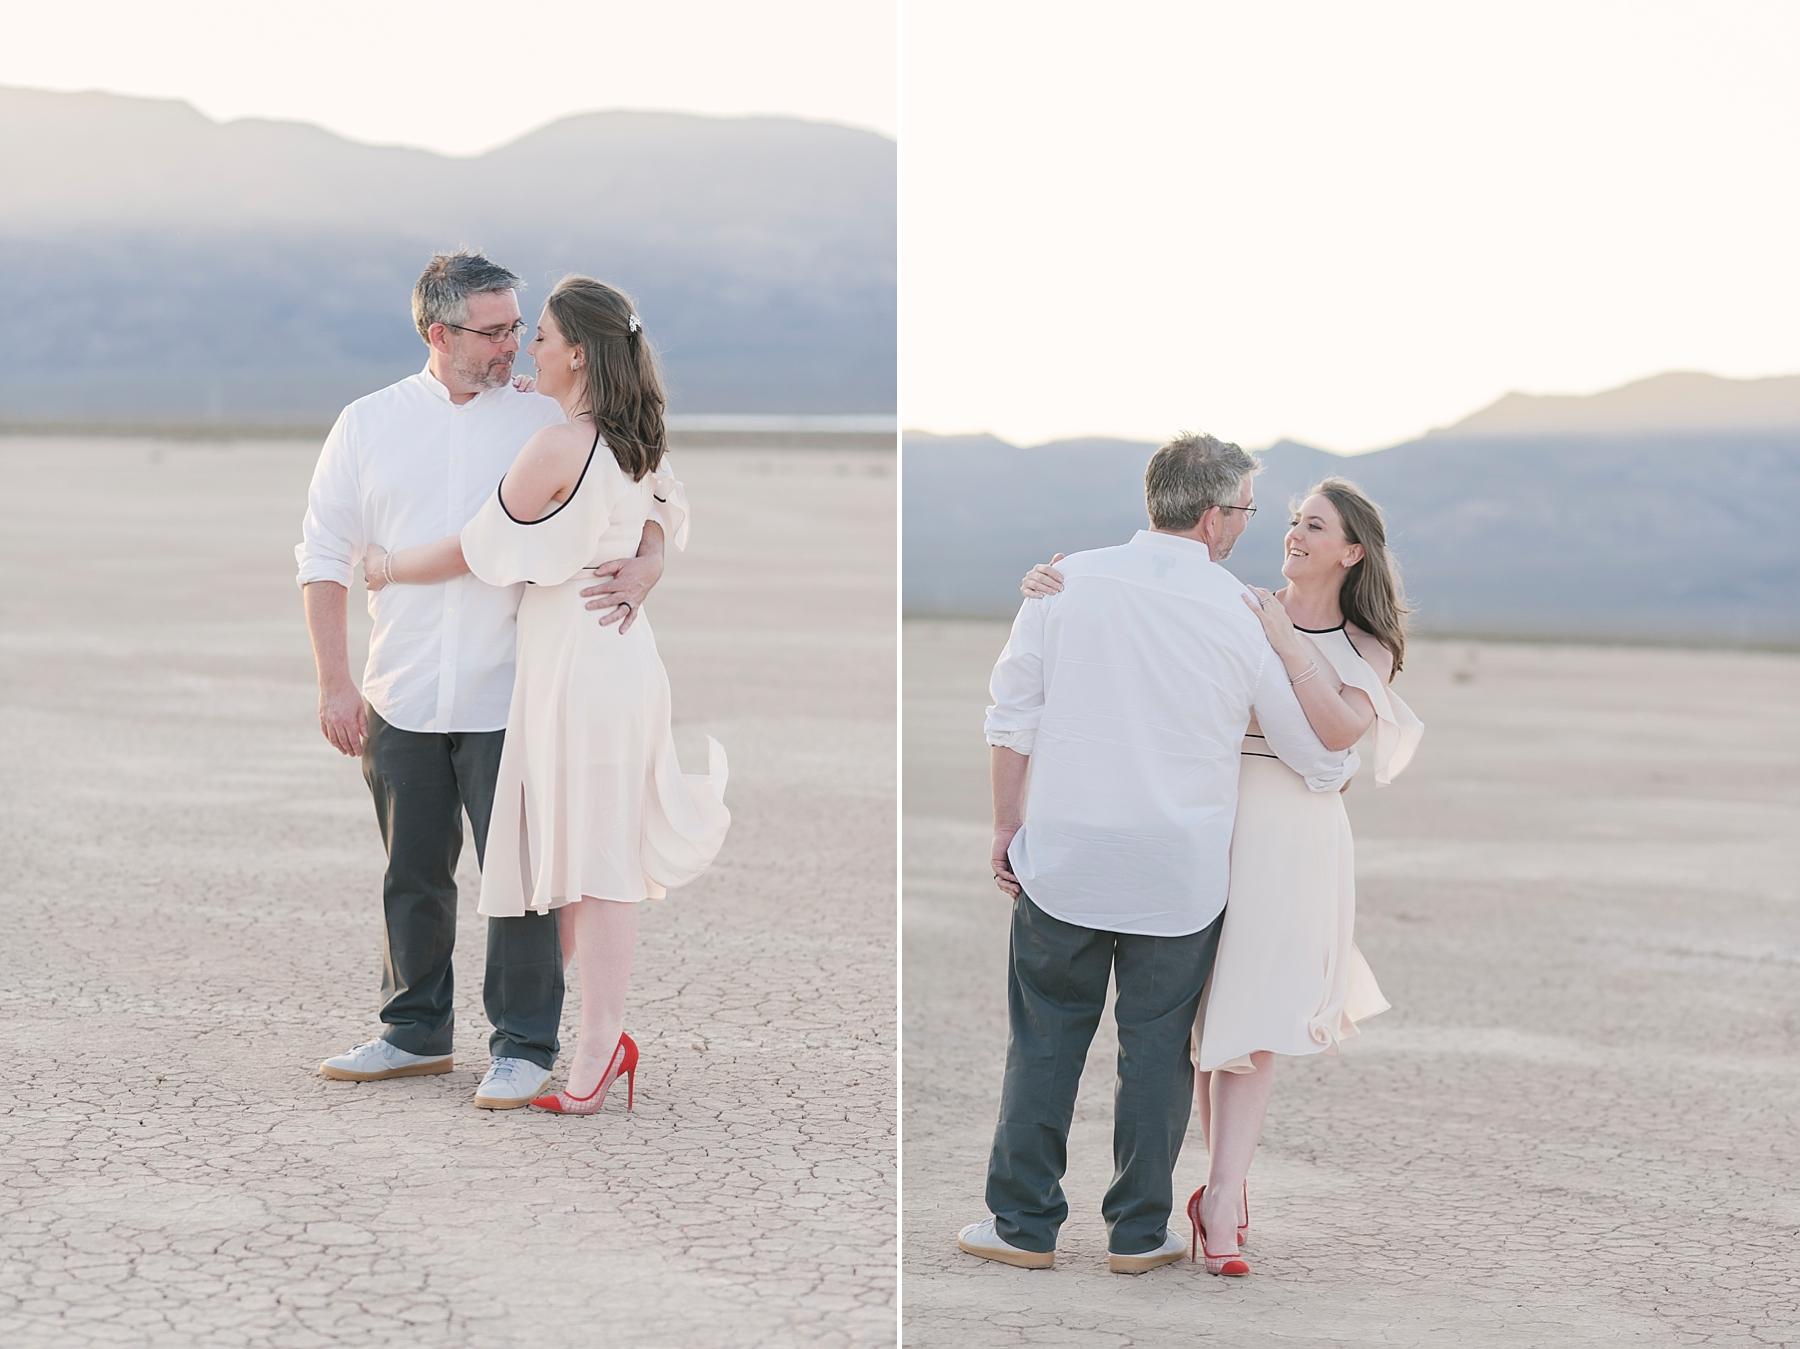 Las_vegas_desert_dry_lake_bed_elopement-7.jpg